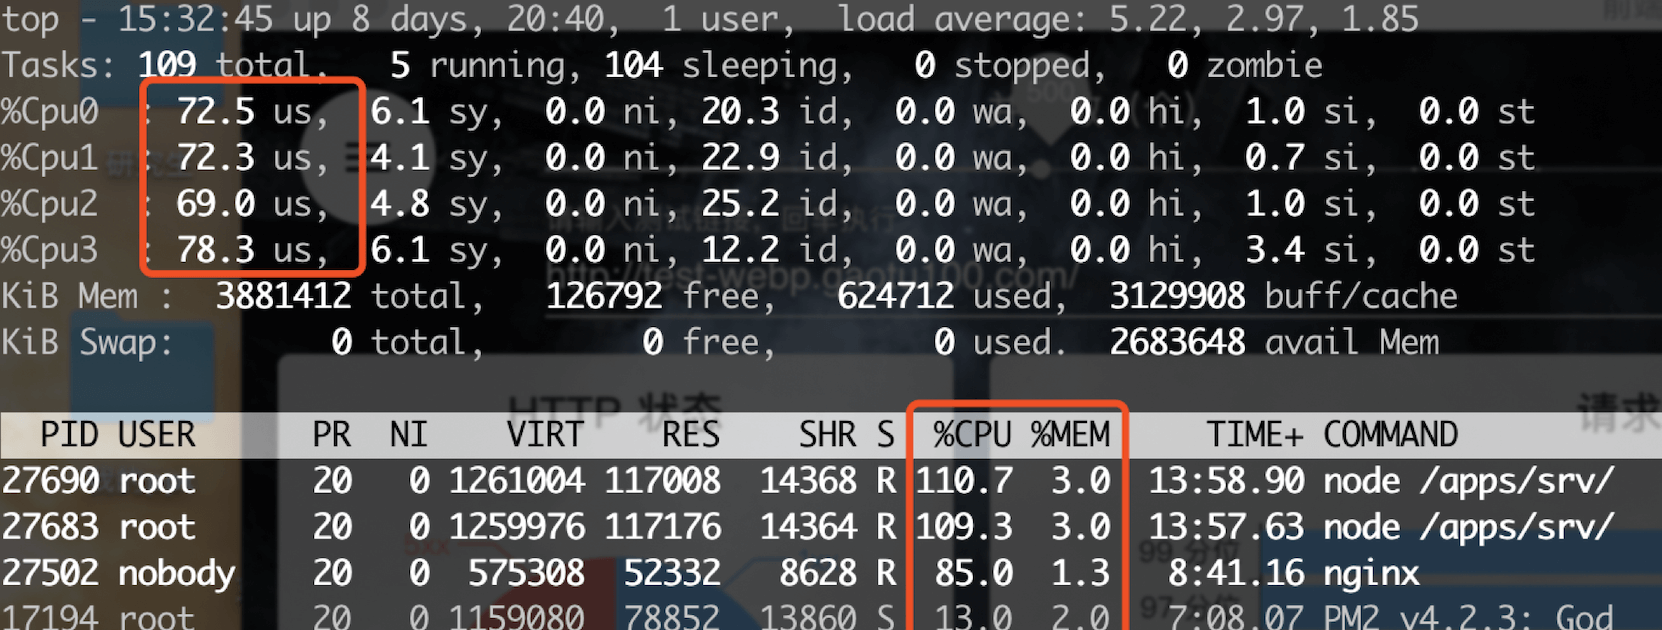 Nginx CPU